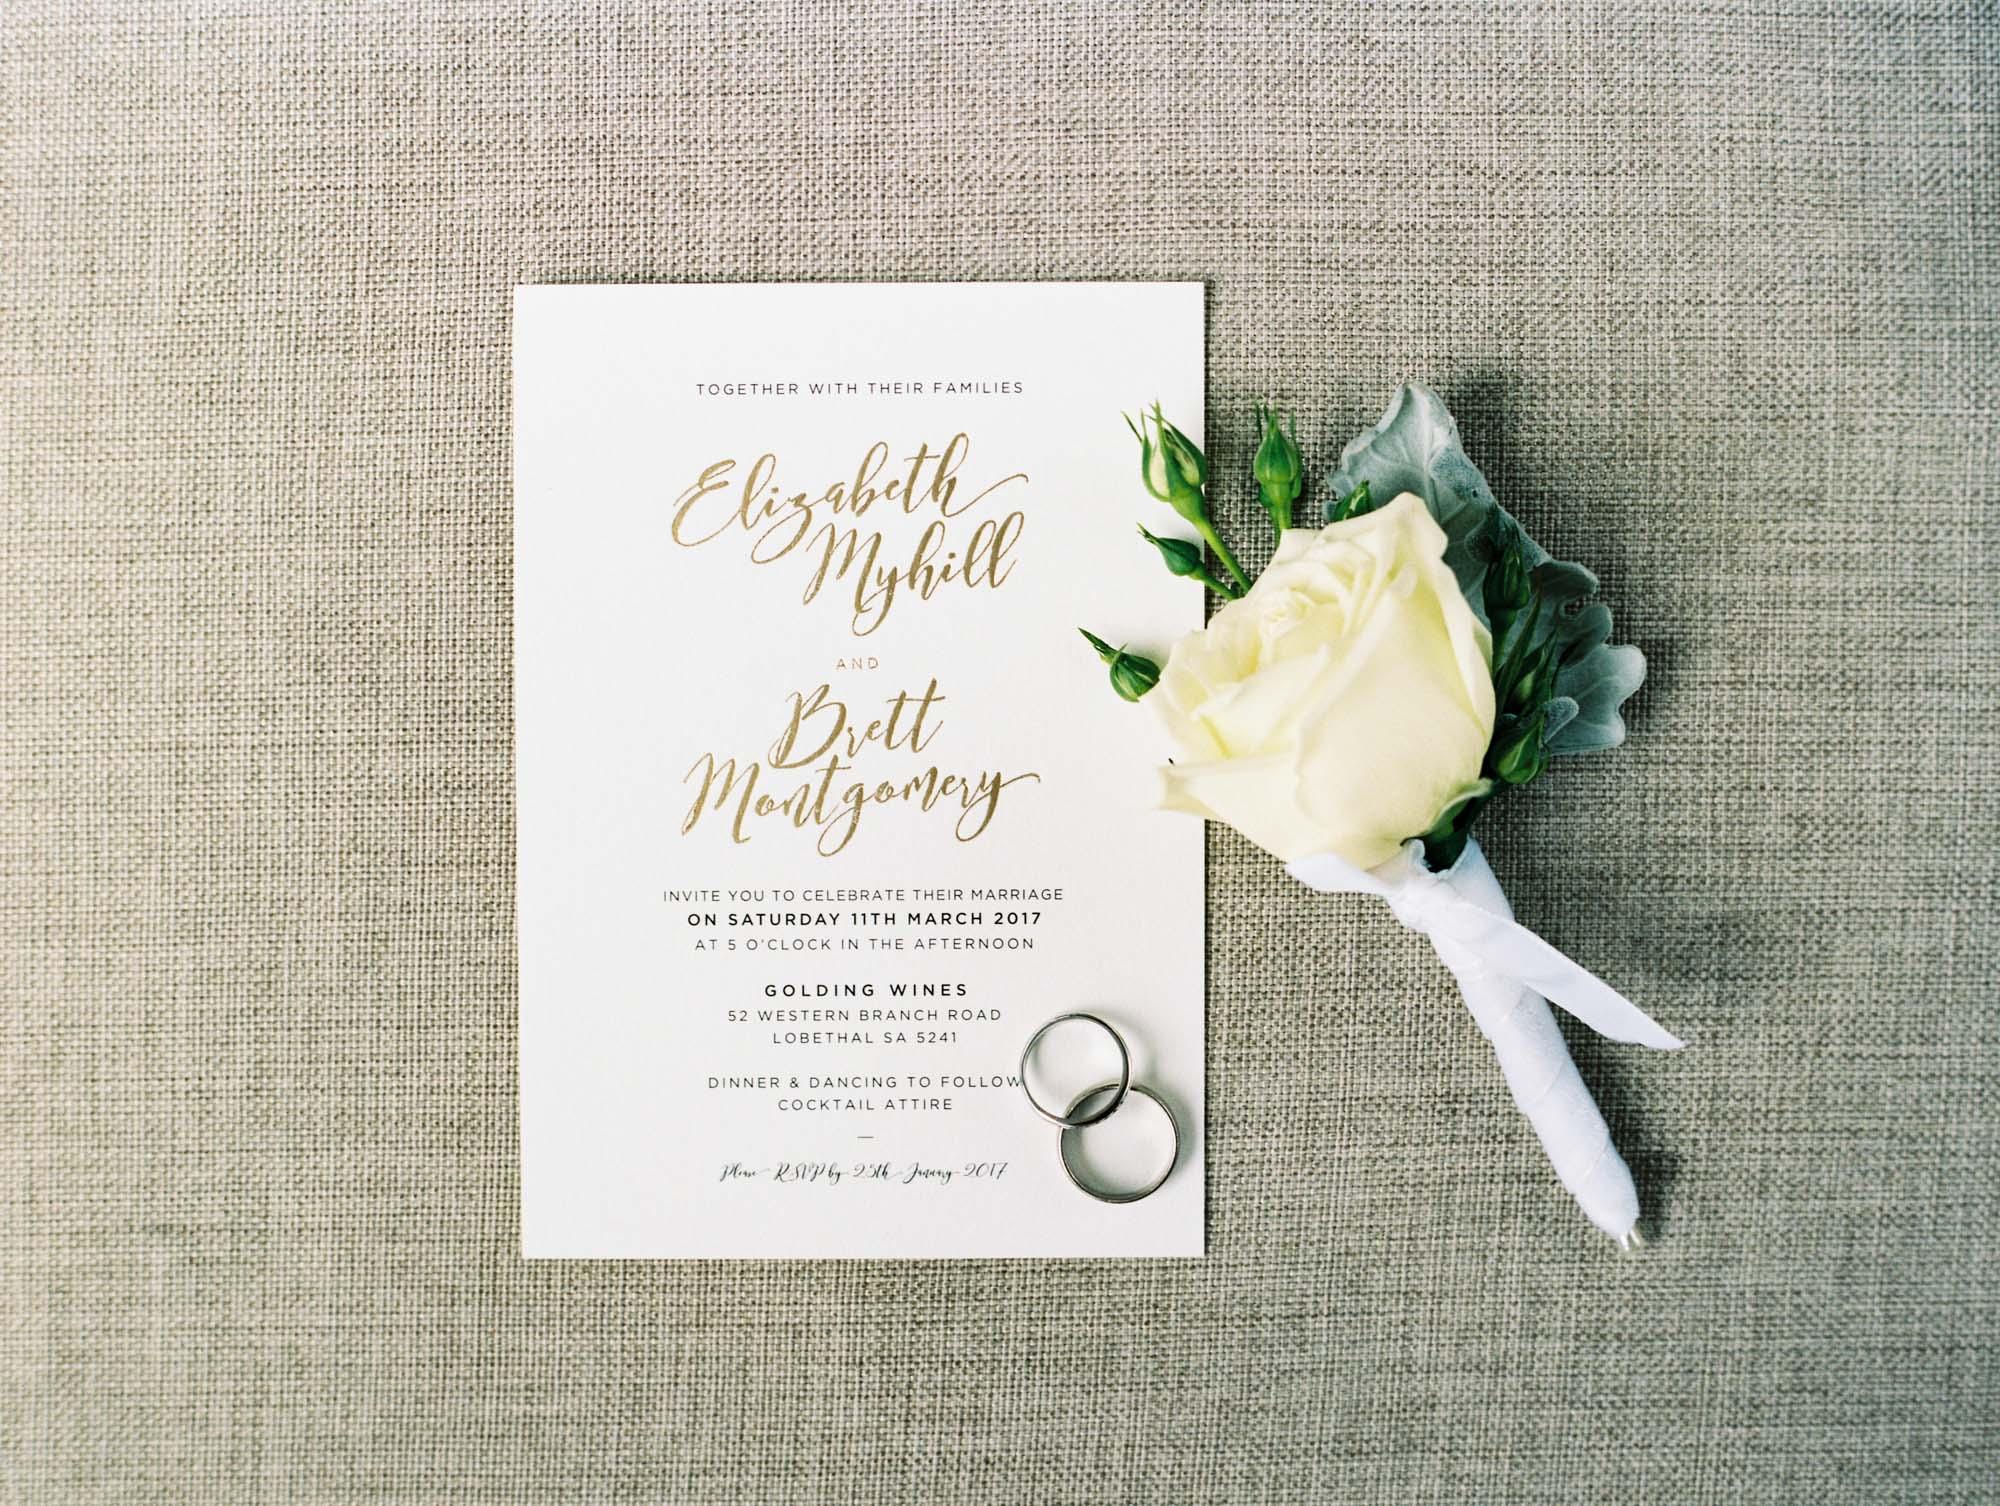 Golding-Wines-wedding-photography-001.jpg